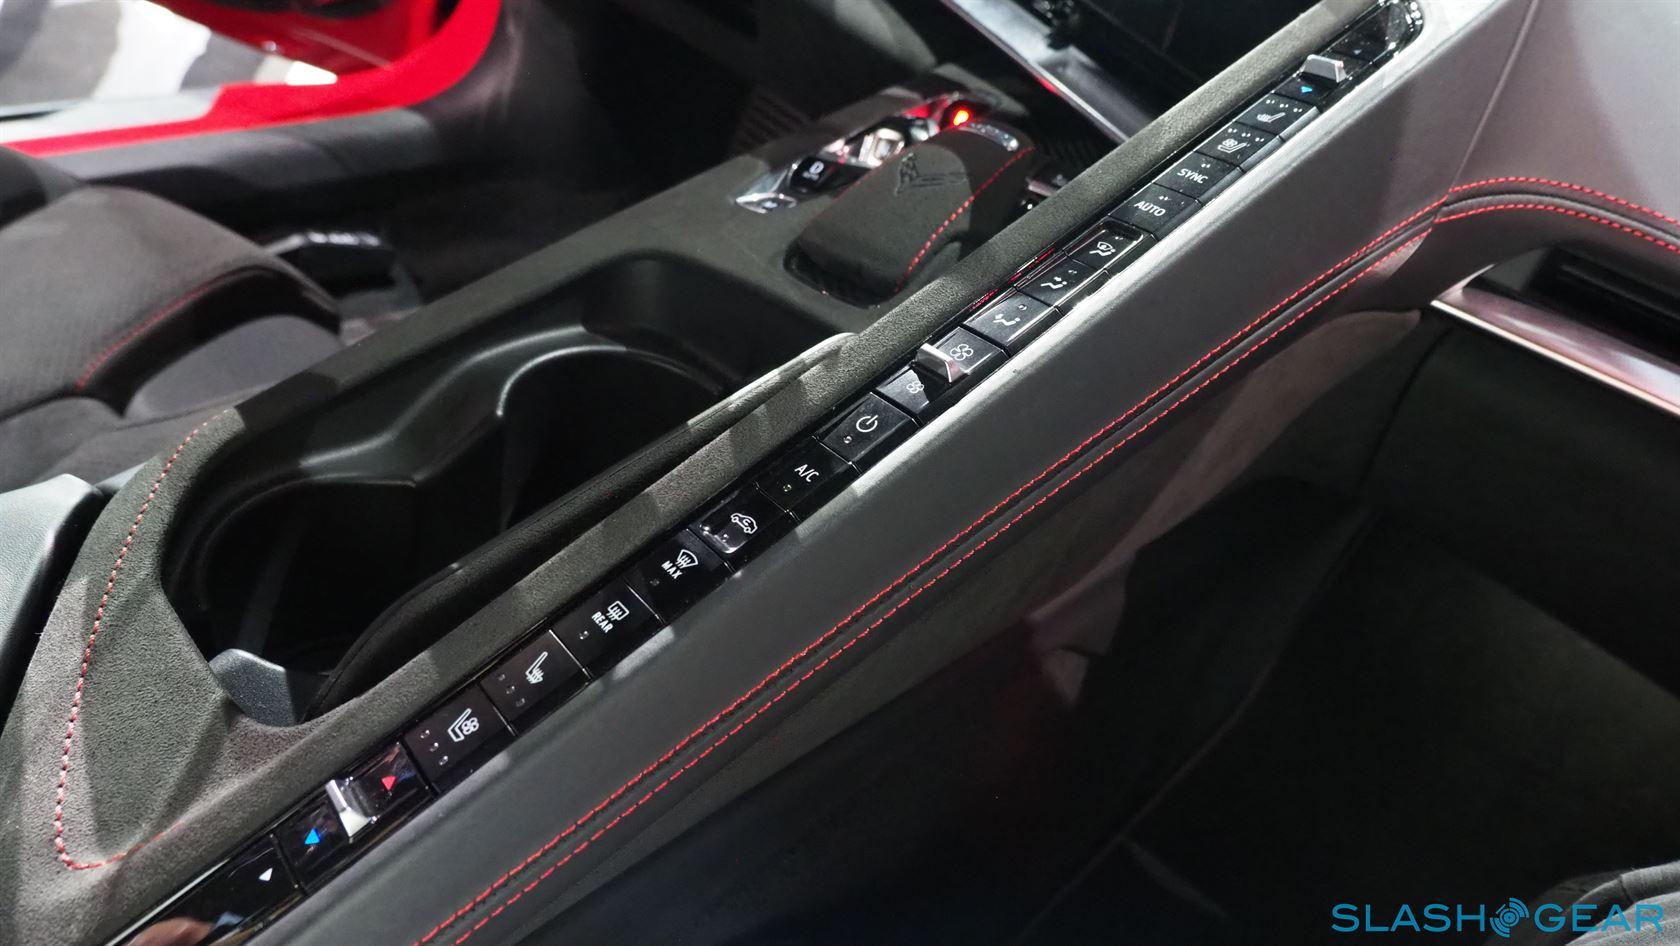 2020 Chevrolet Corvette Stingray C8 Interior Review: Cabin ...